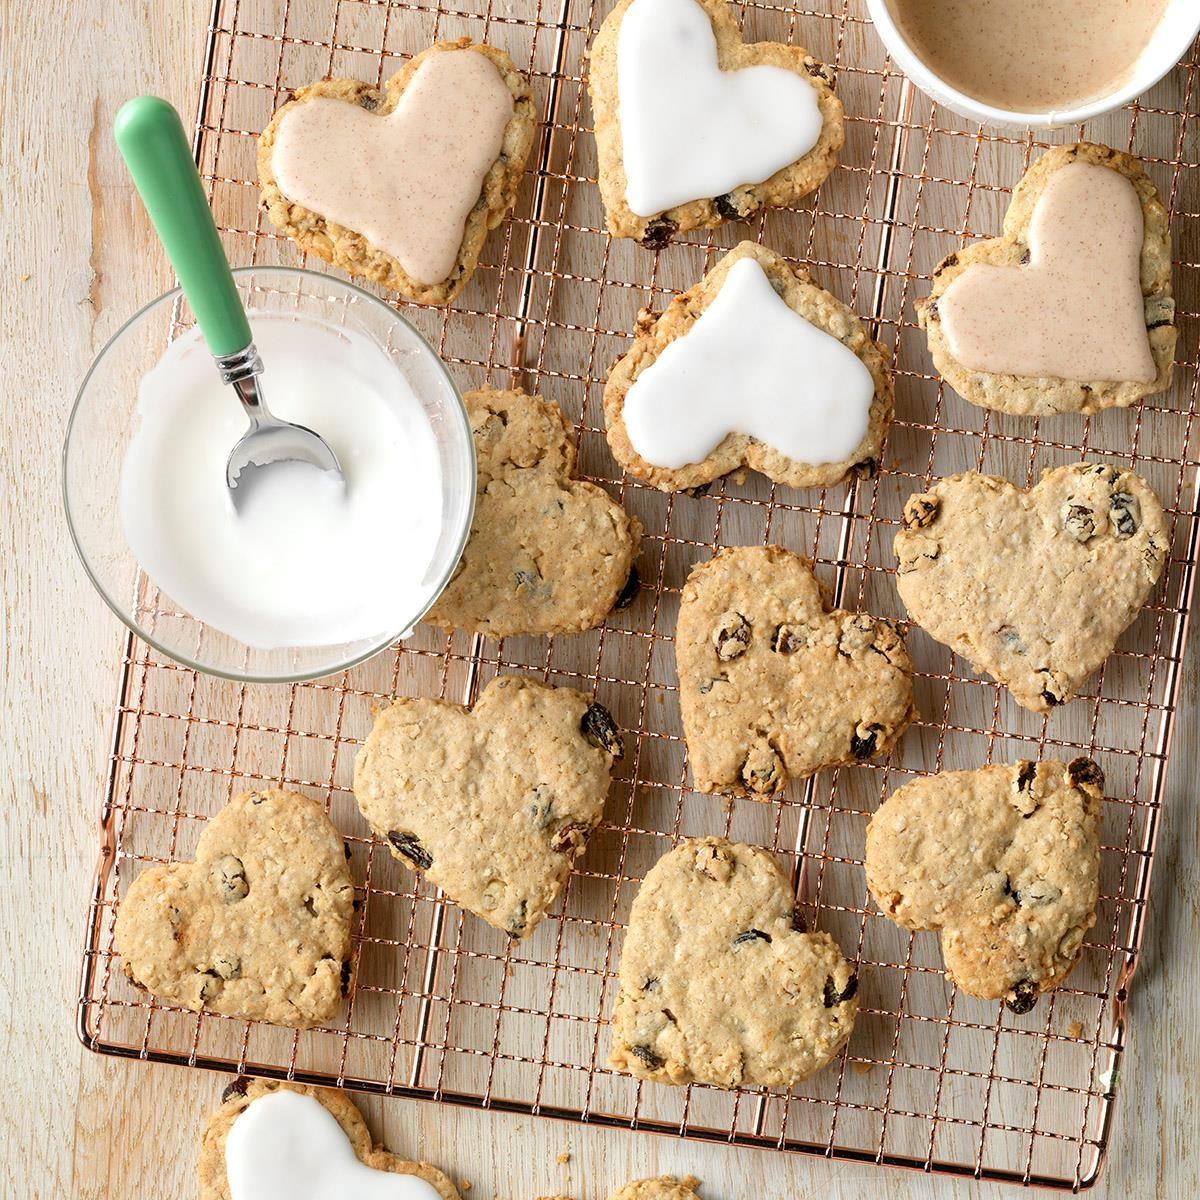 1910s: Oatmeal Cookies